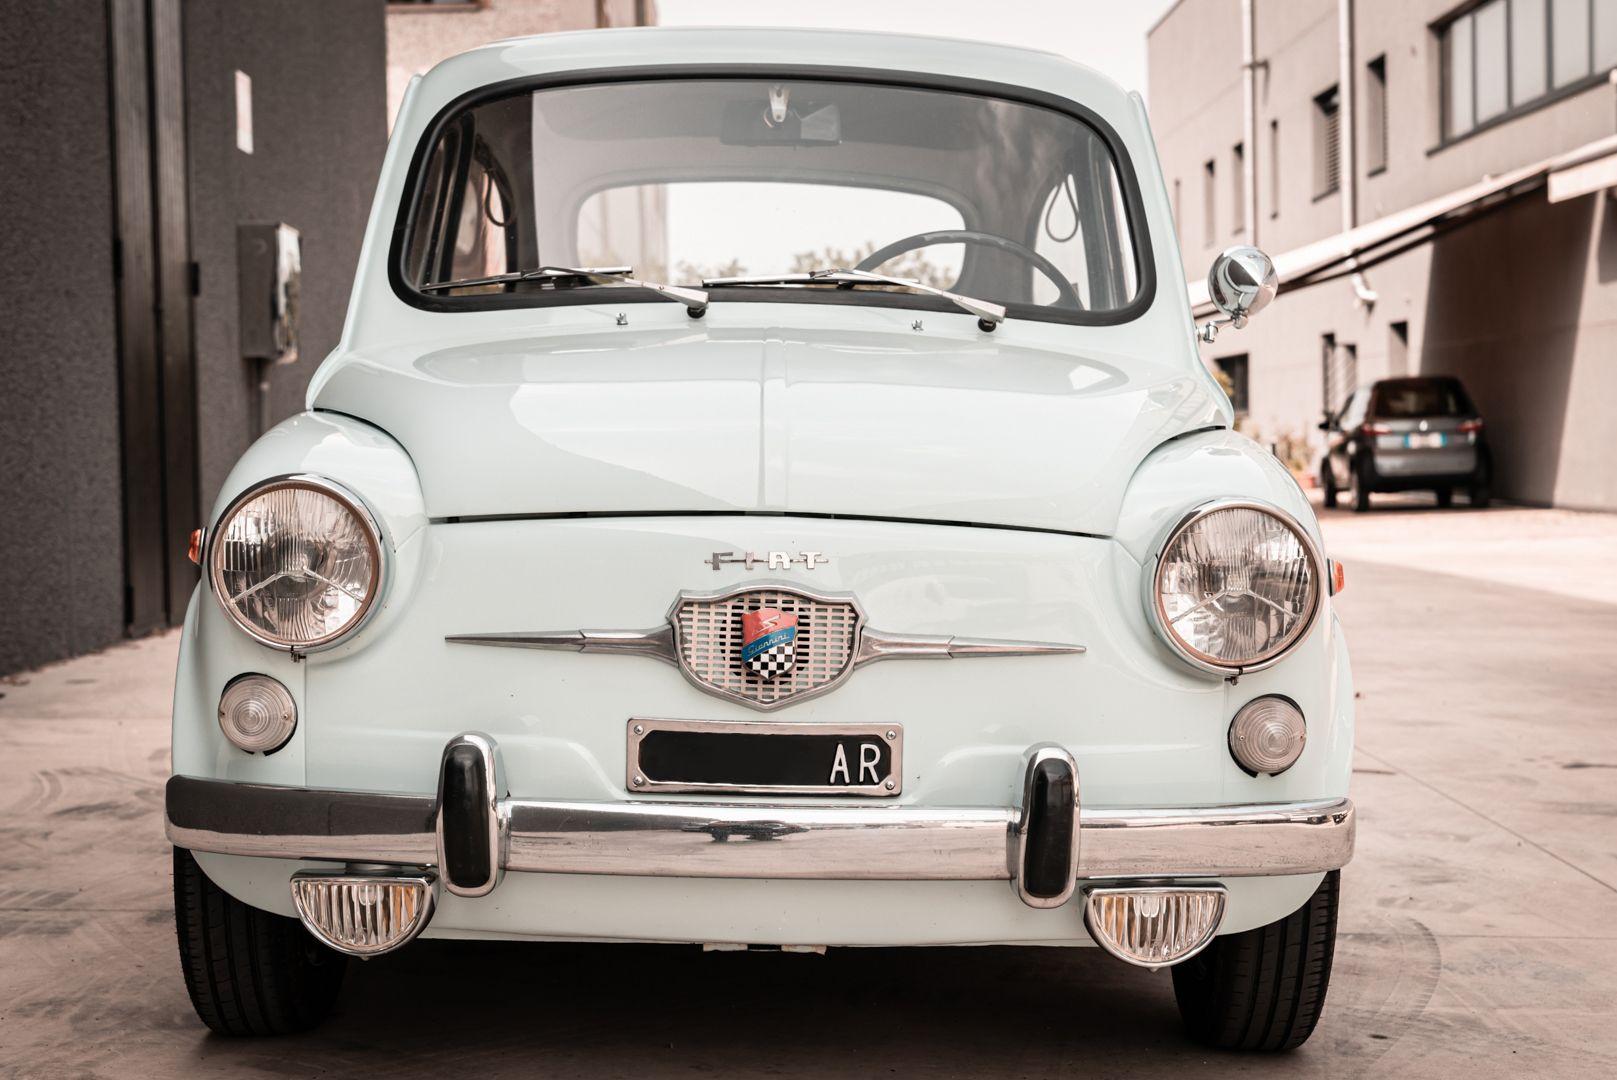 1968 Fiat Giannini 750 TV Turismo Veloce 77085